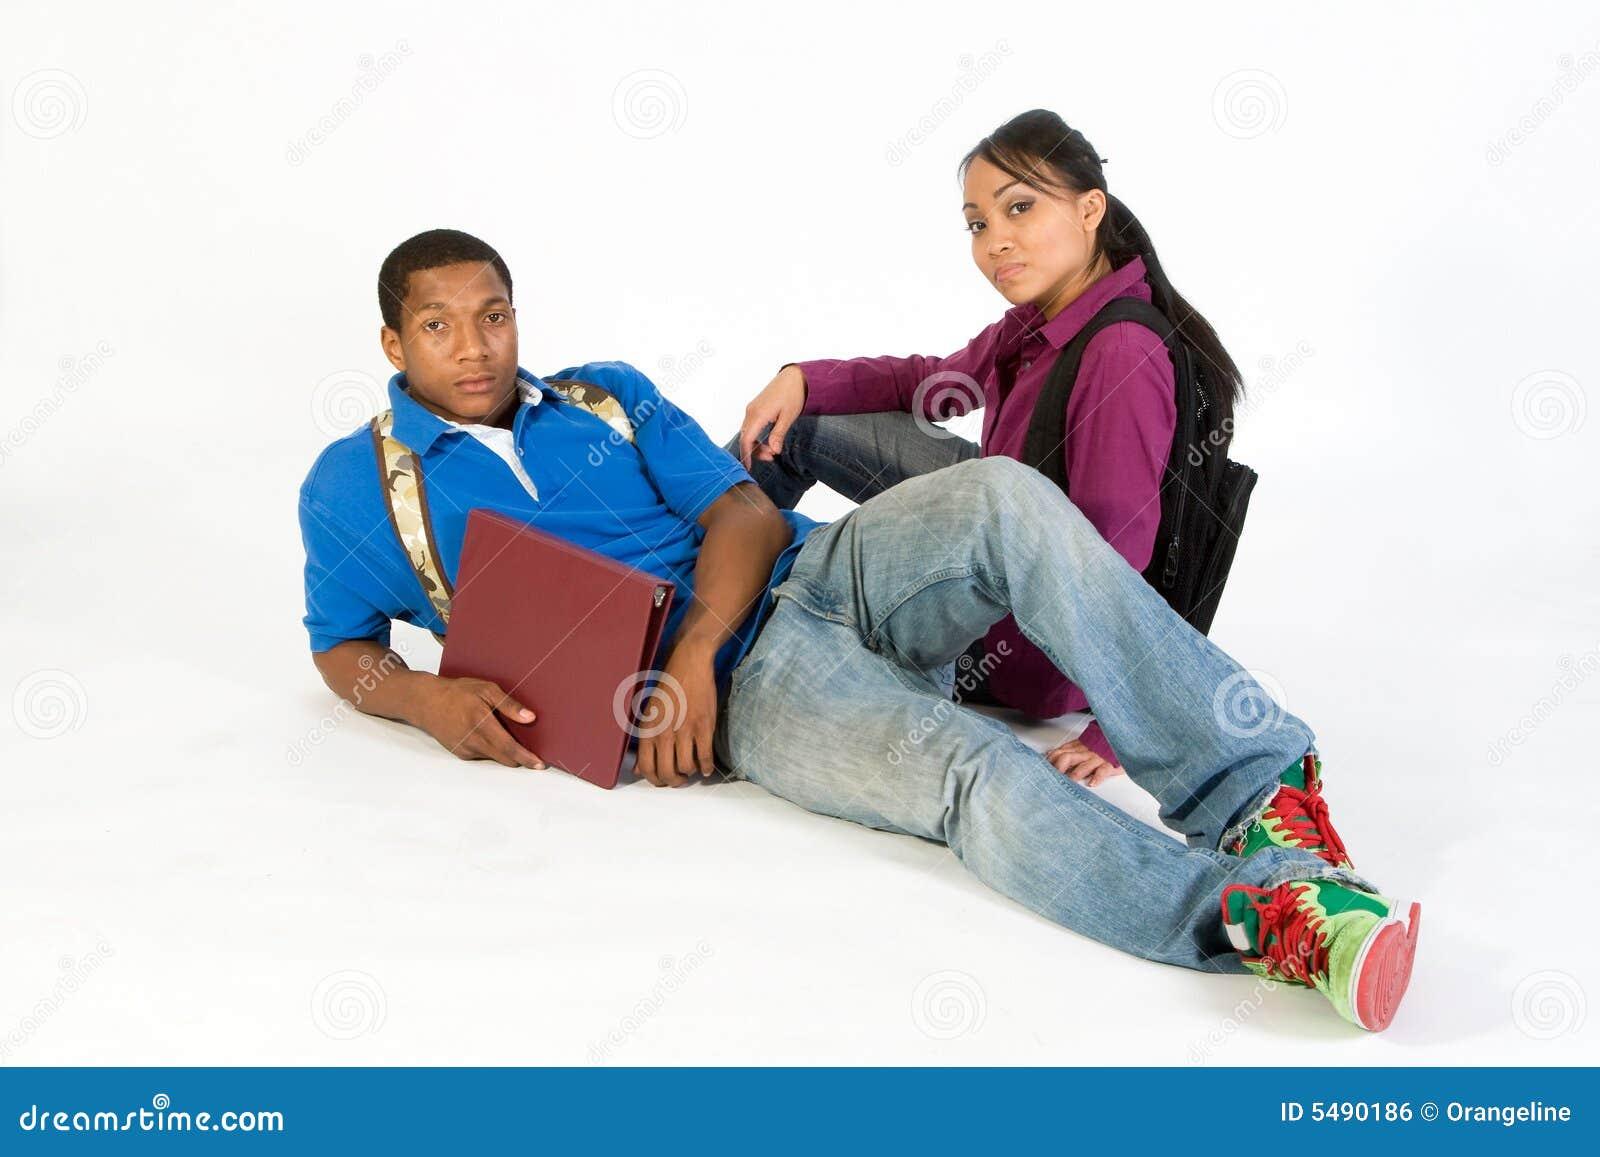 Serious Students- Horizontal